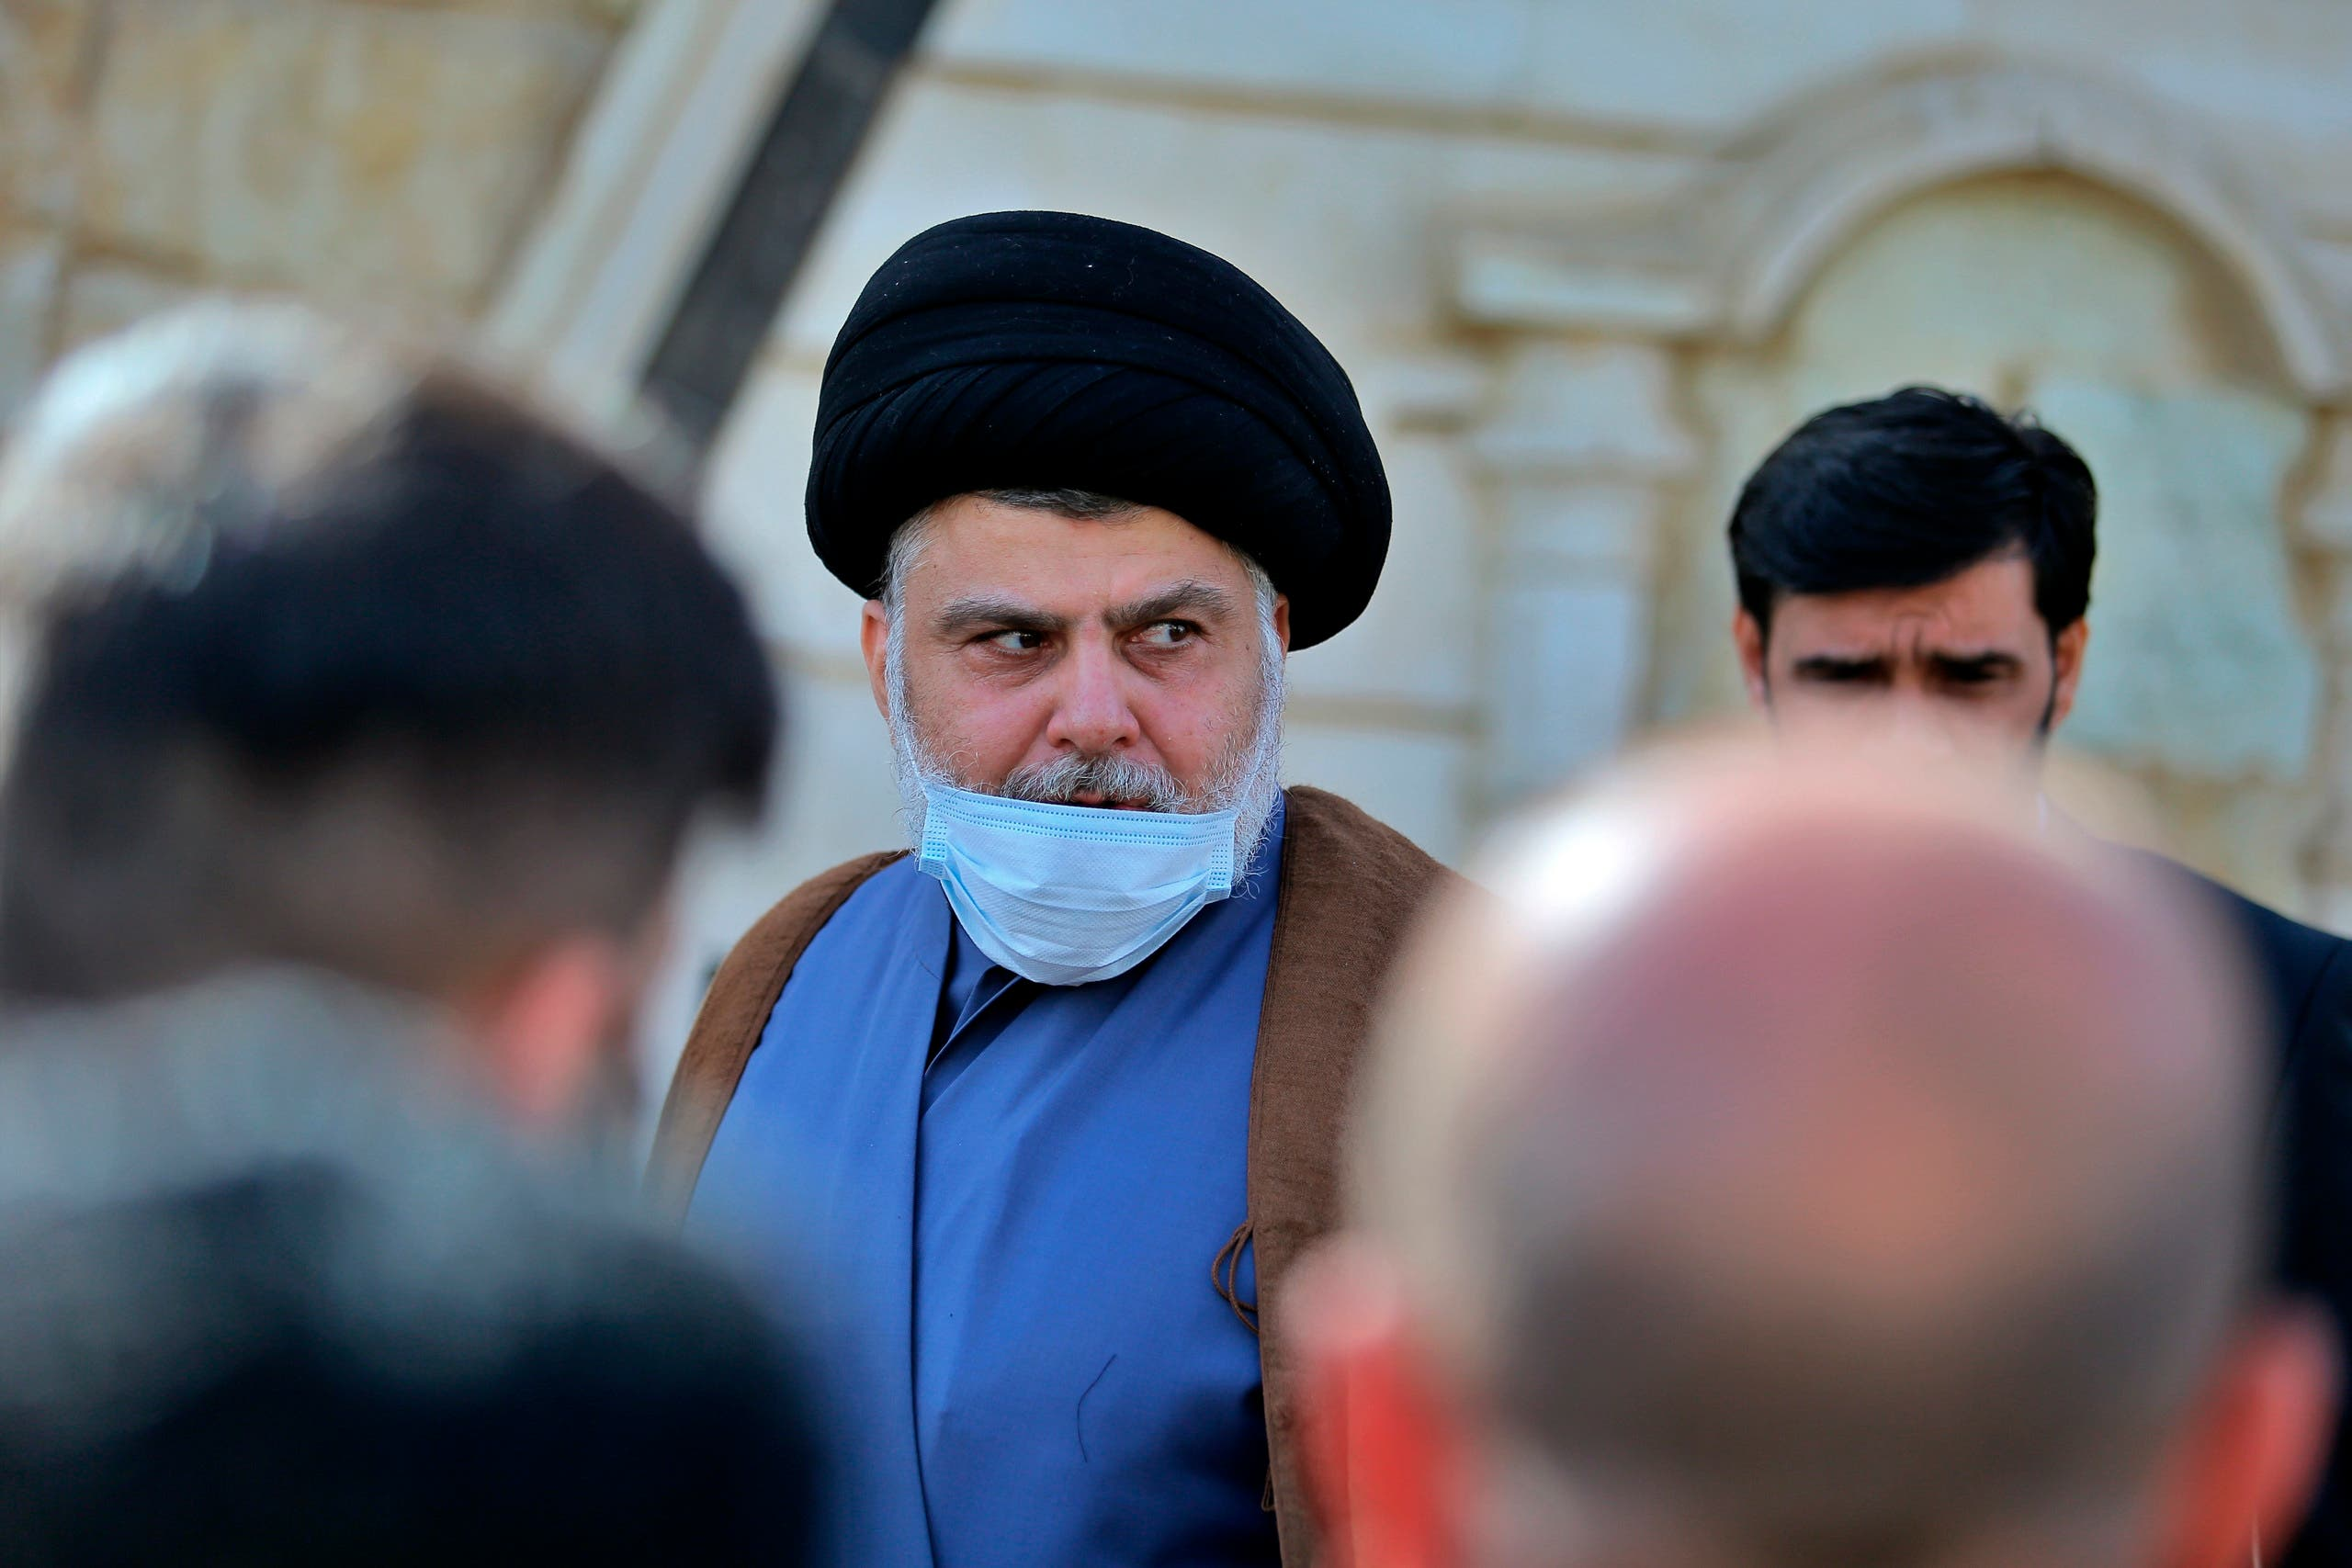 Muqtada al-Sadr, center, leaves a news conference in Najaf, Iraq, Wednesday, Feb. 10, 2021. (AP)